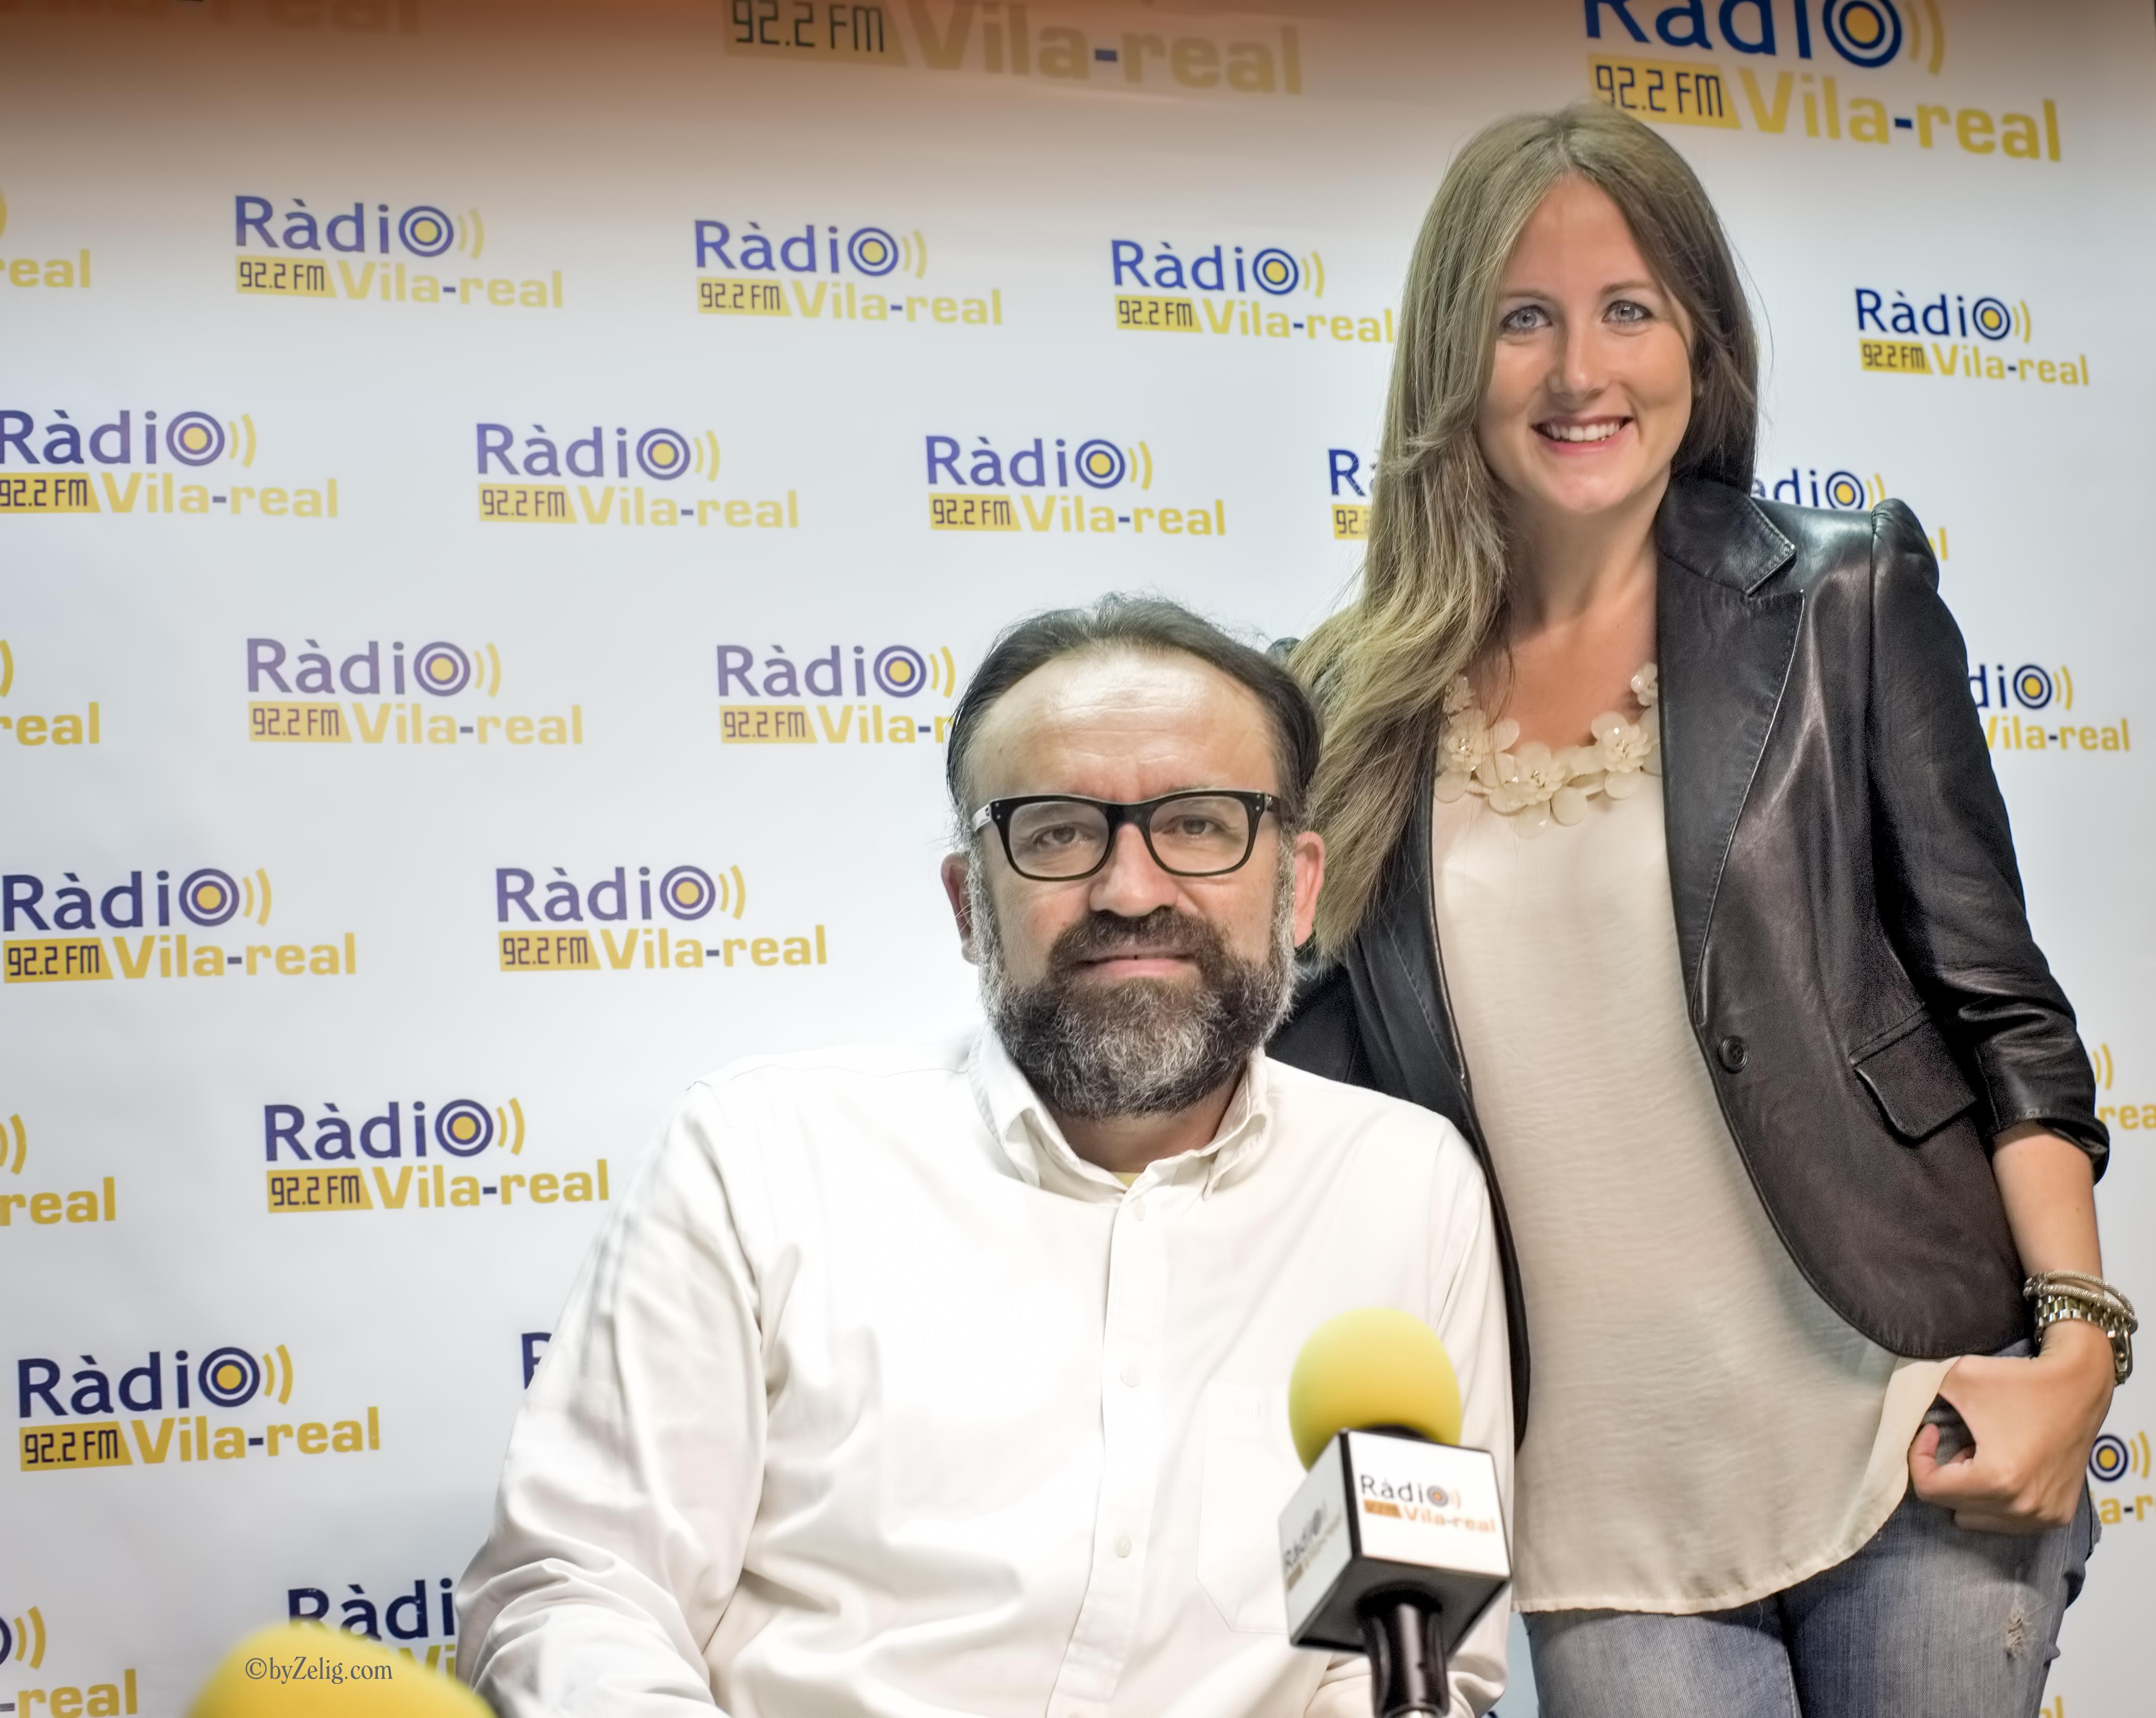 Esports Radio Vila-real. Programa del 7 de febrero de 2017